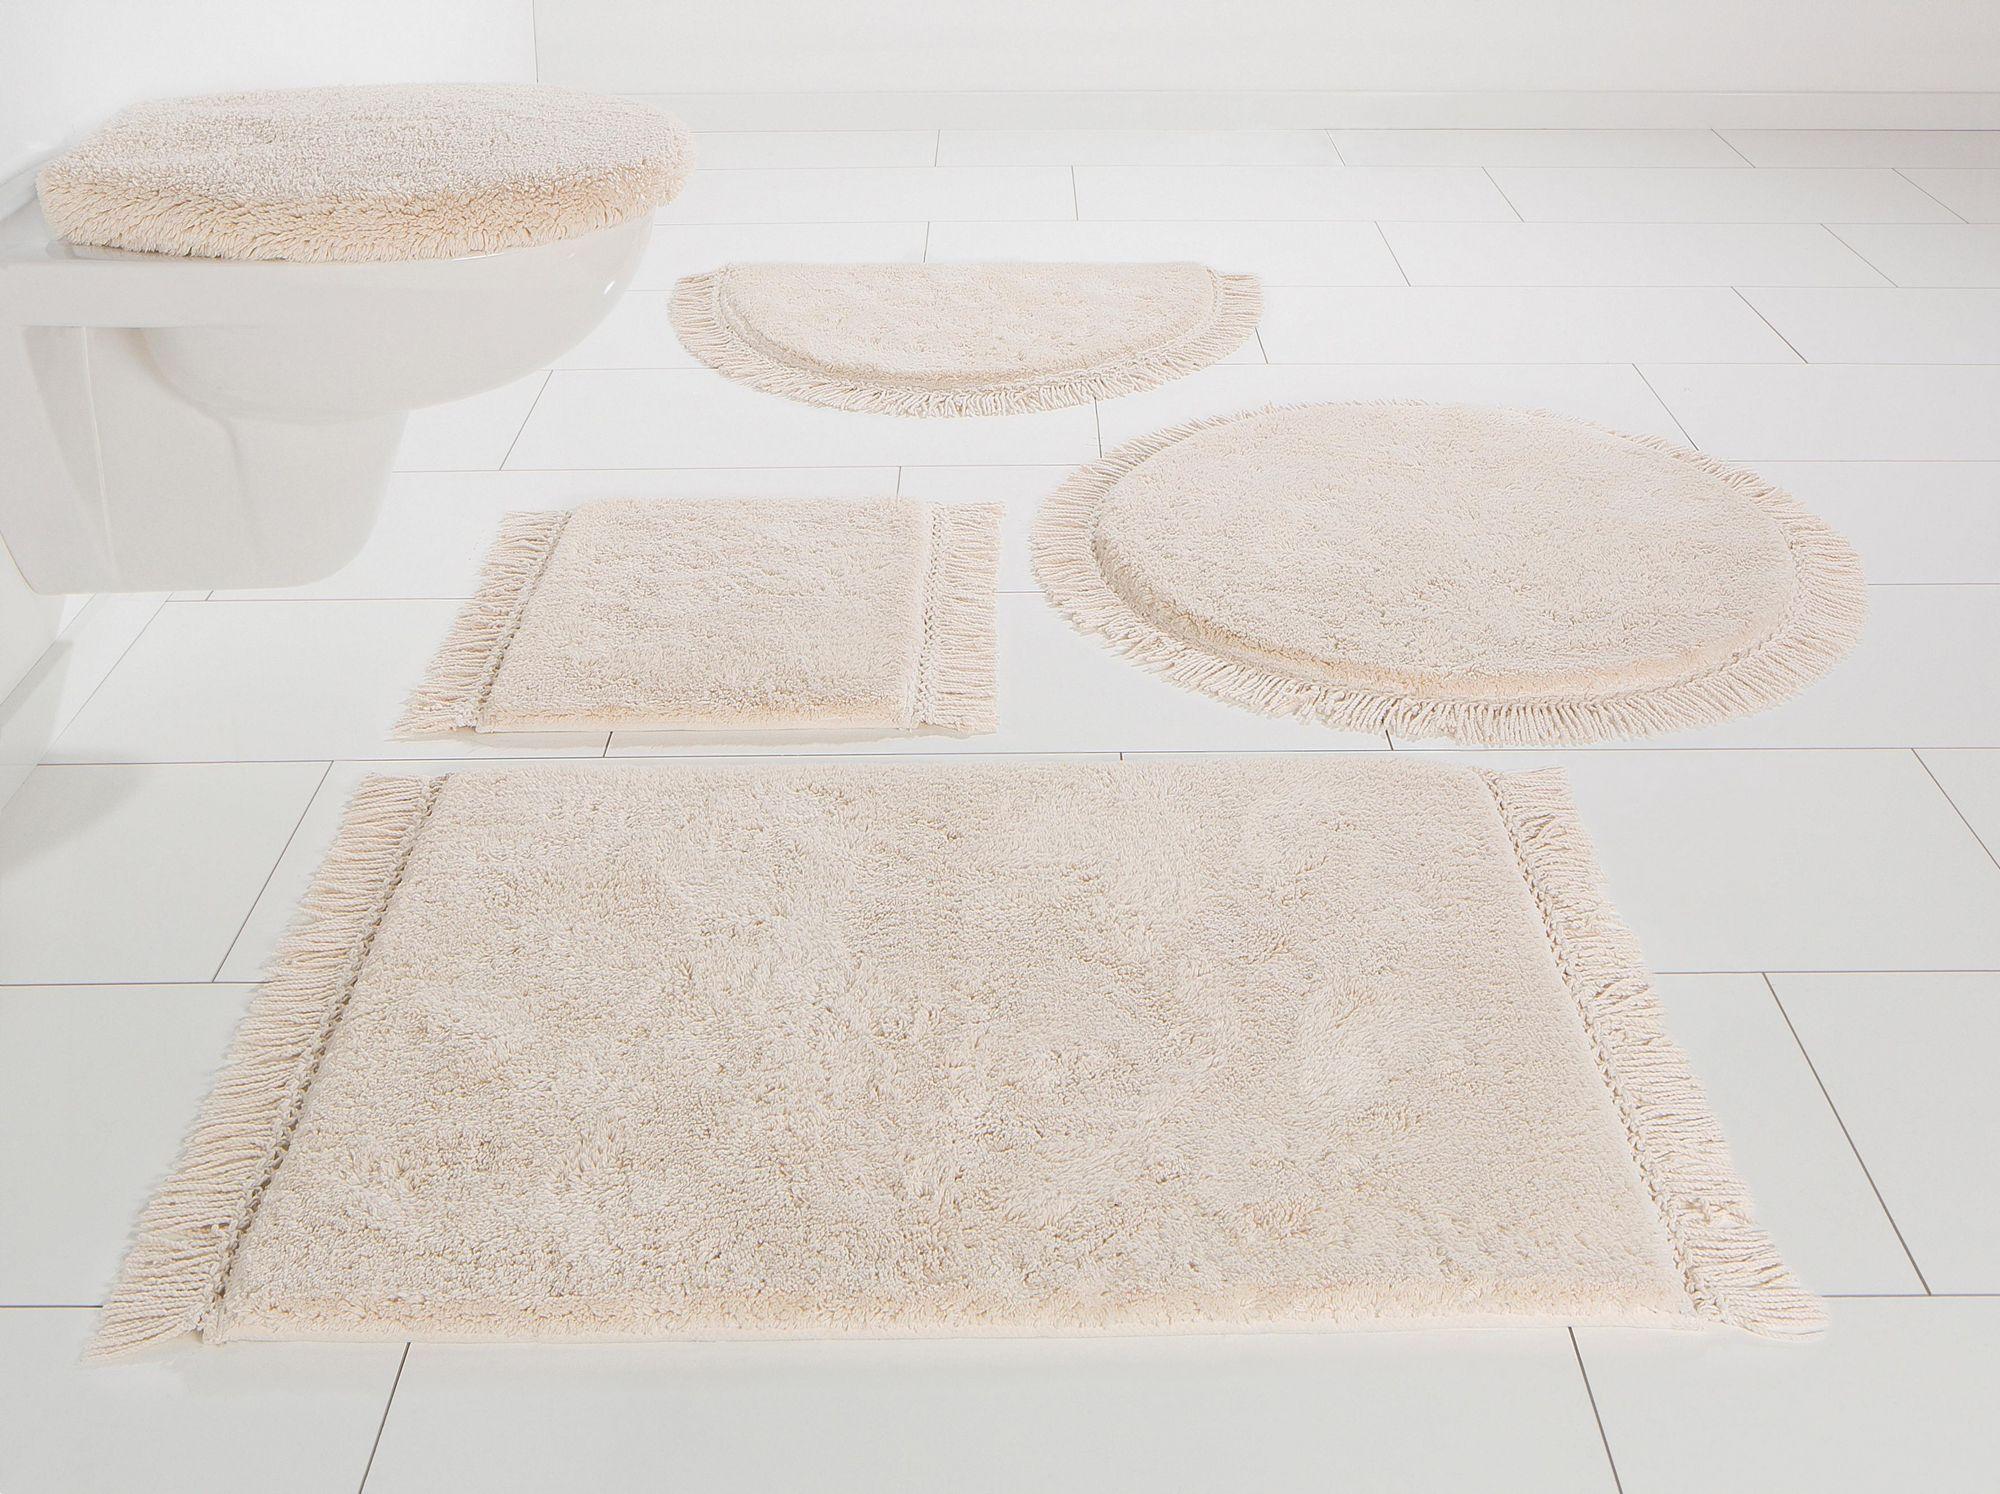 HOME AFFAIRE COLLECTION Badematte, 3-tlg. Hänge WC-Set, Home affaire Collection, »Finca«, Bio-Baumwolle, Höhe 16 mm